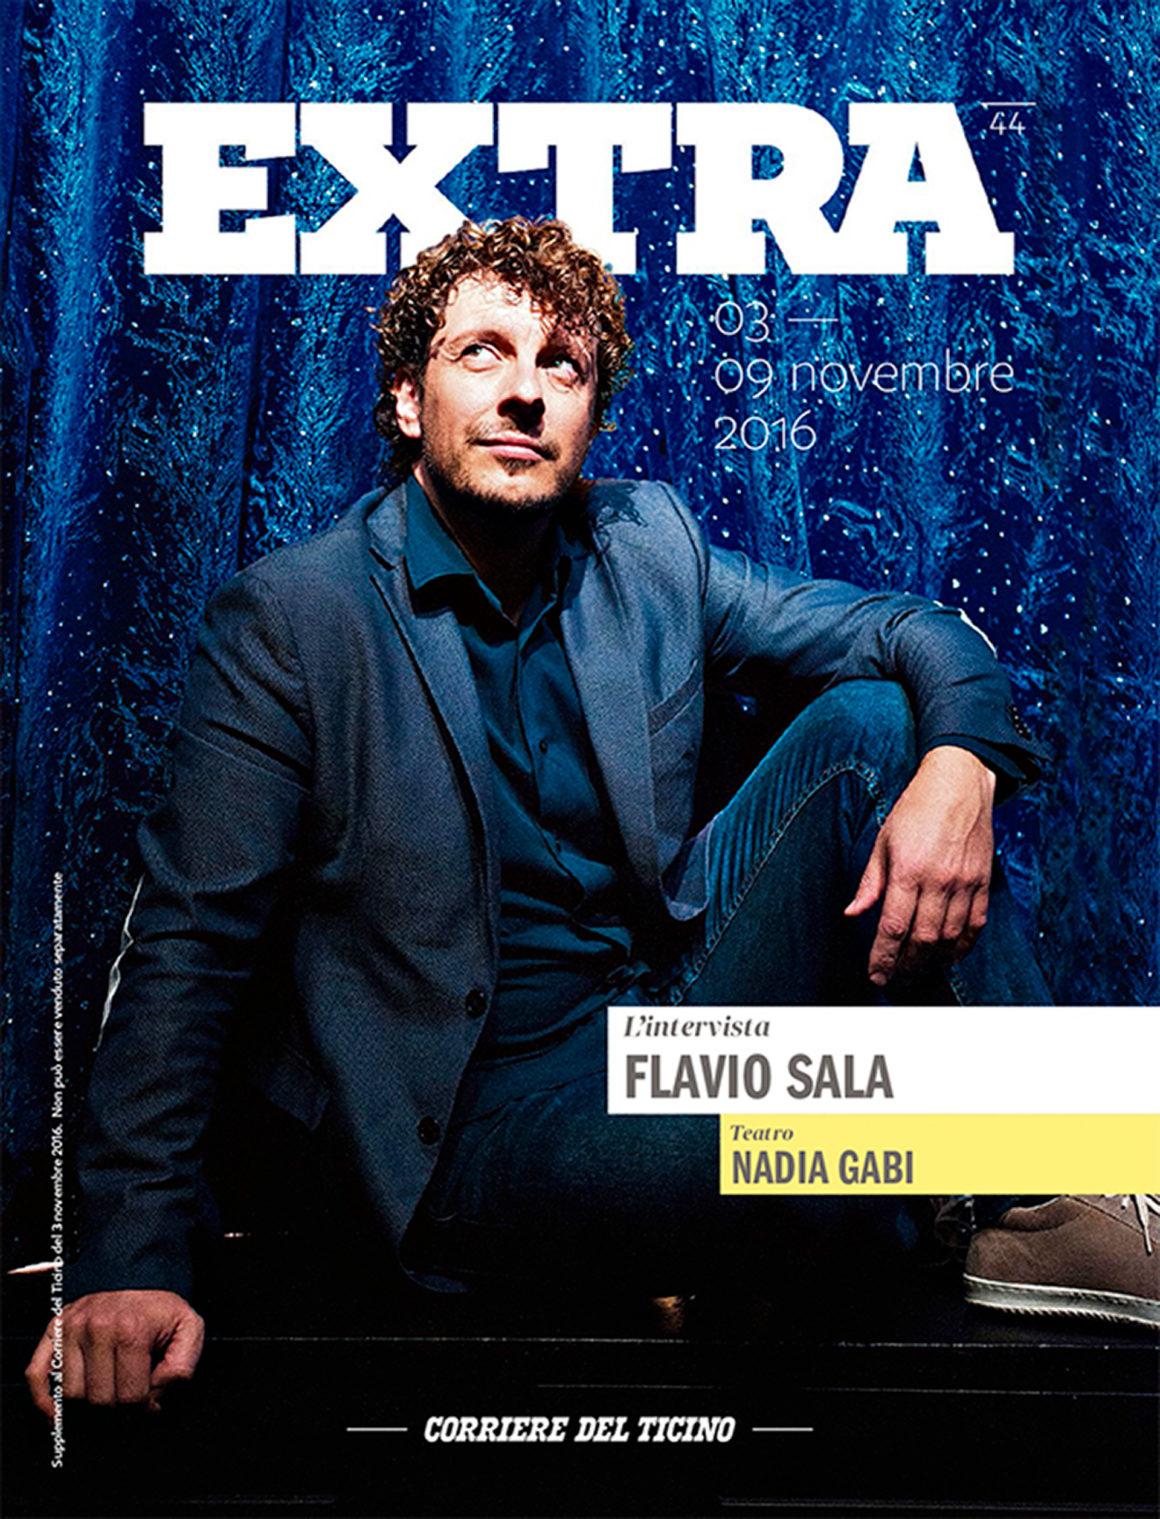 Intervista a Flavio Sala